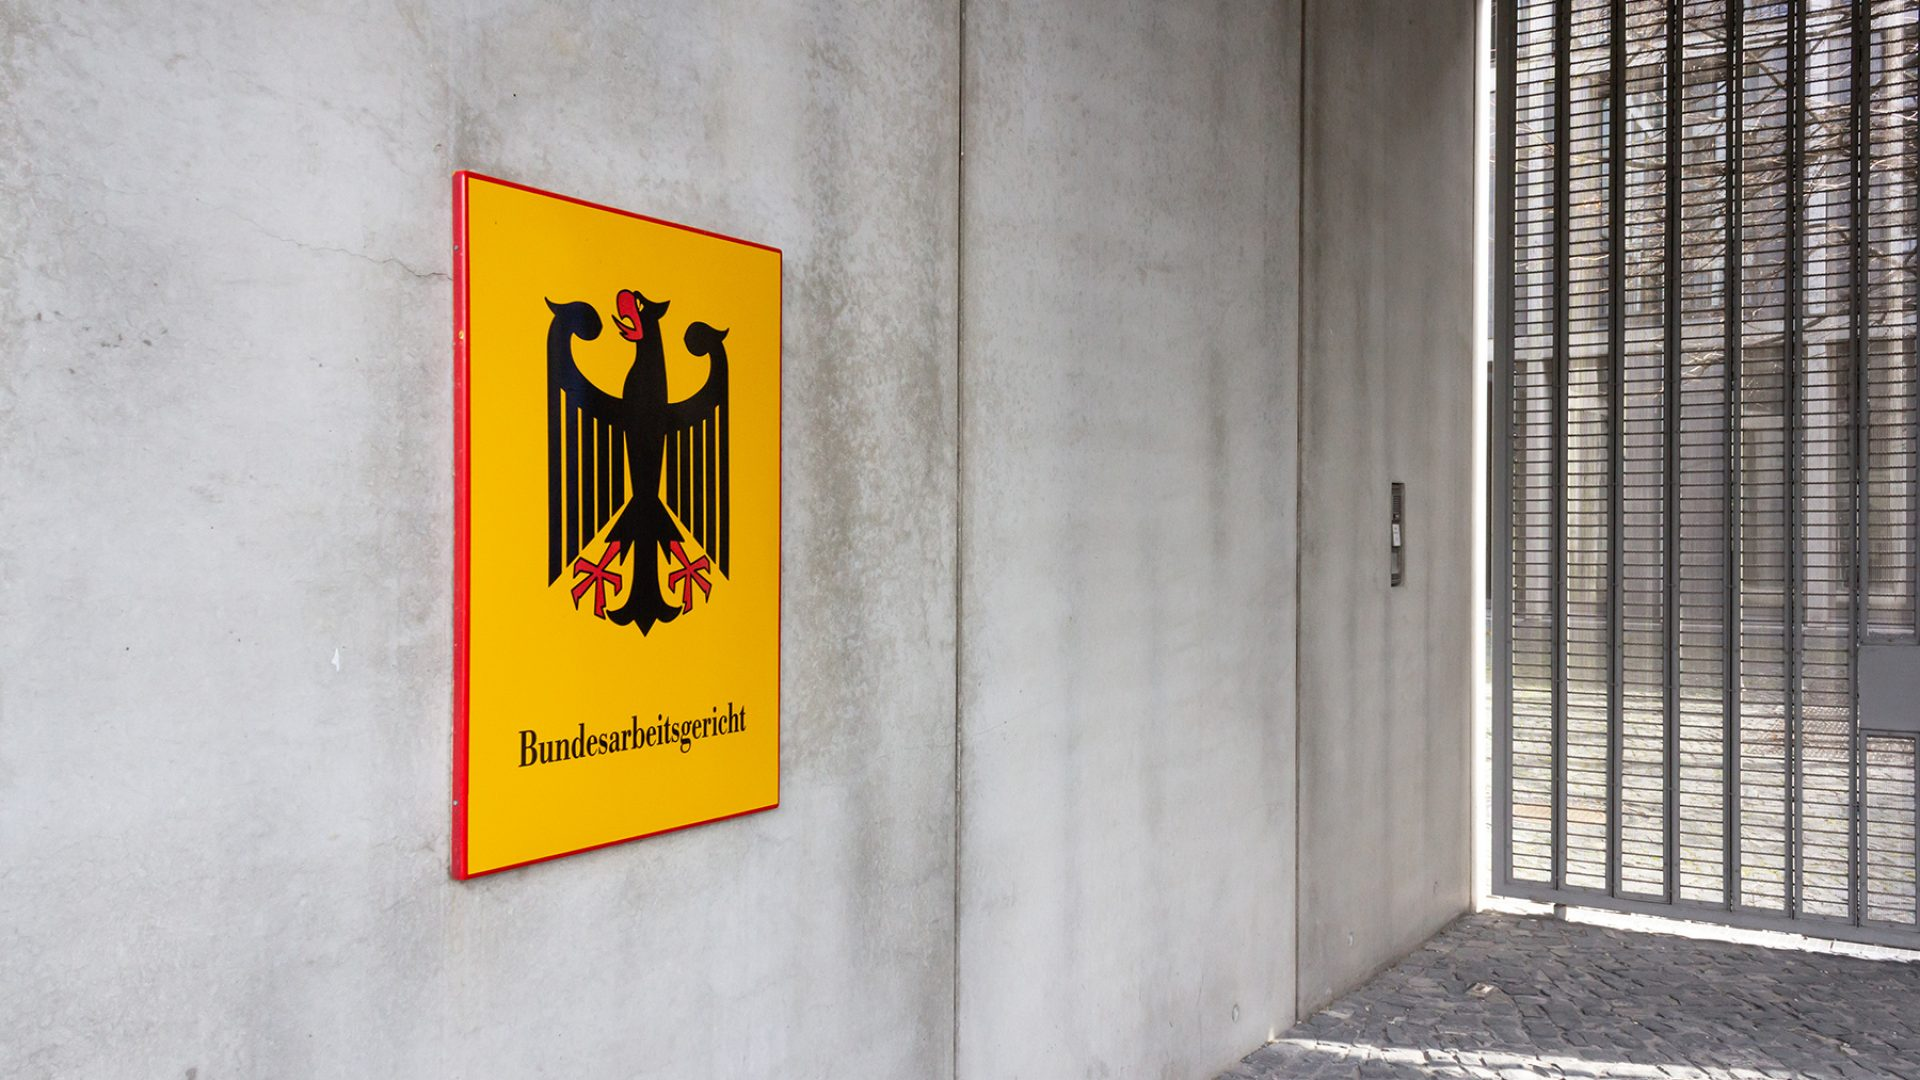 German labor law